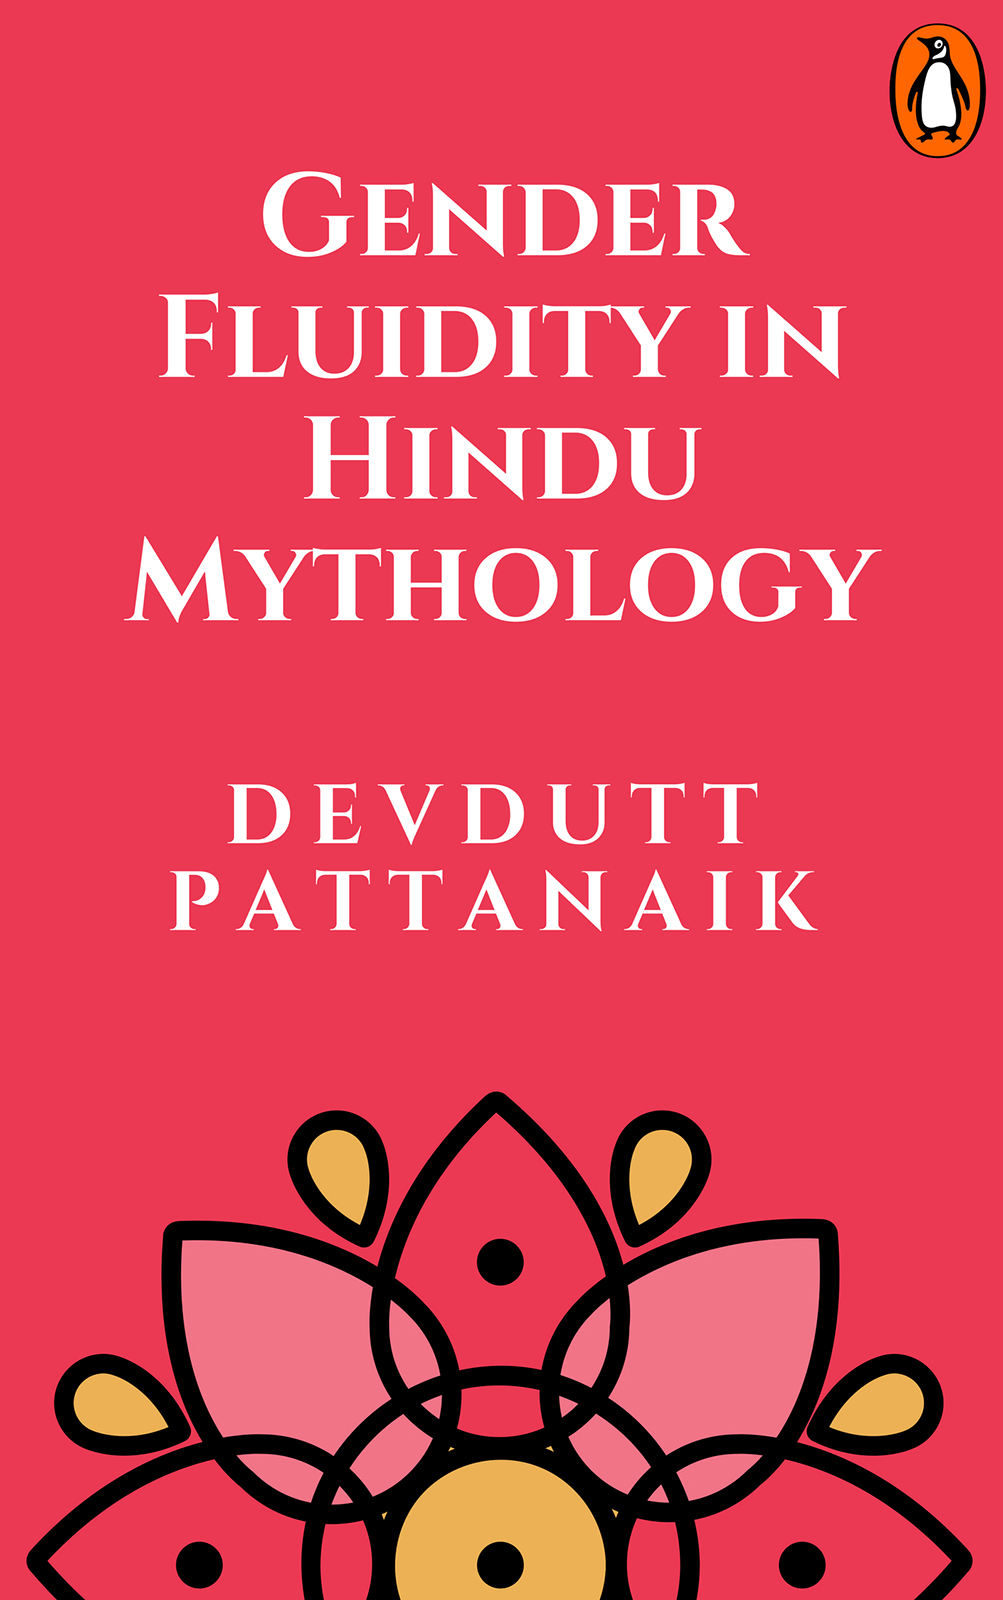 Gender Fluidity in Hindu Mythology